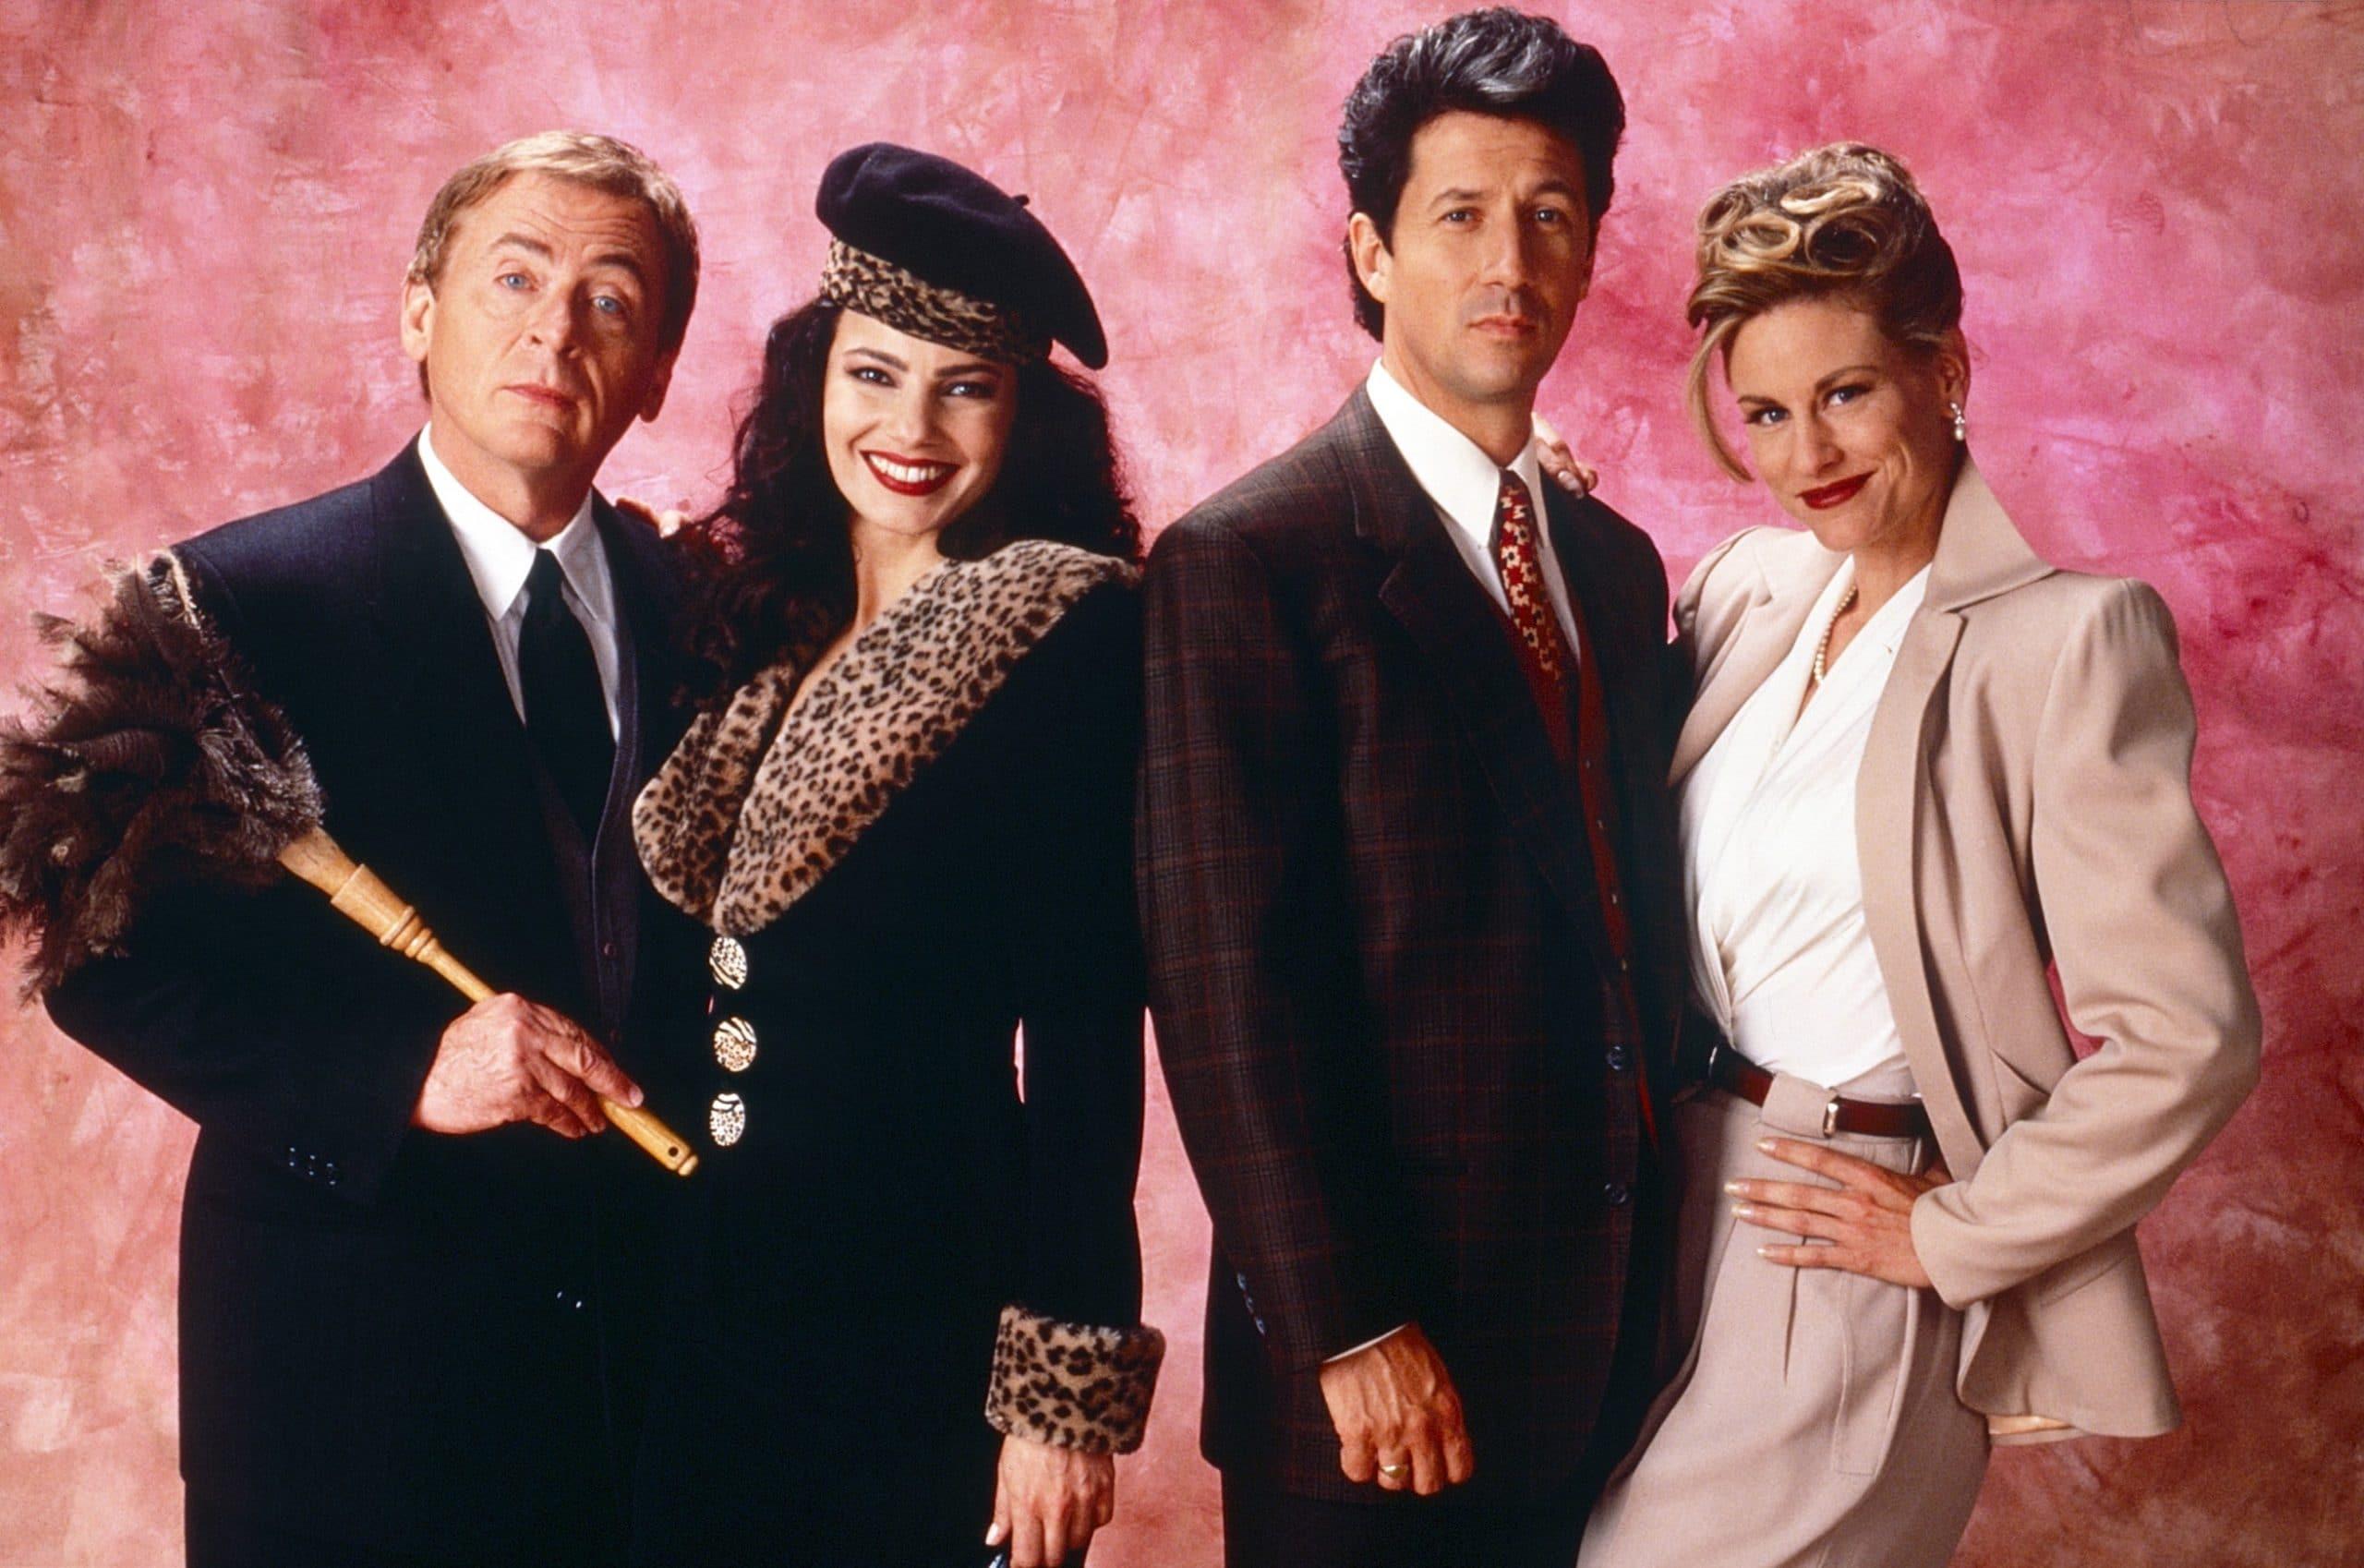 THE NANNY, from left: Daniel Davis, Fran Drescher, Charles Shaughnessy, Lauren Lane